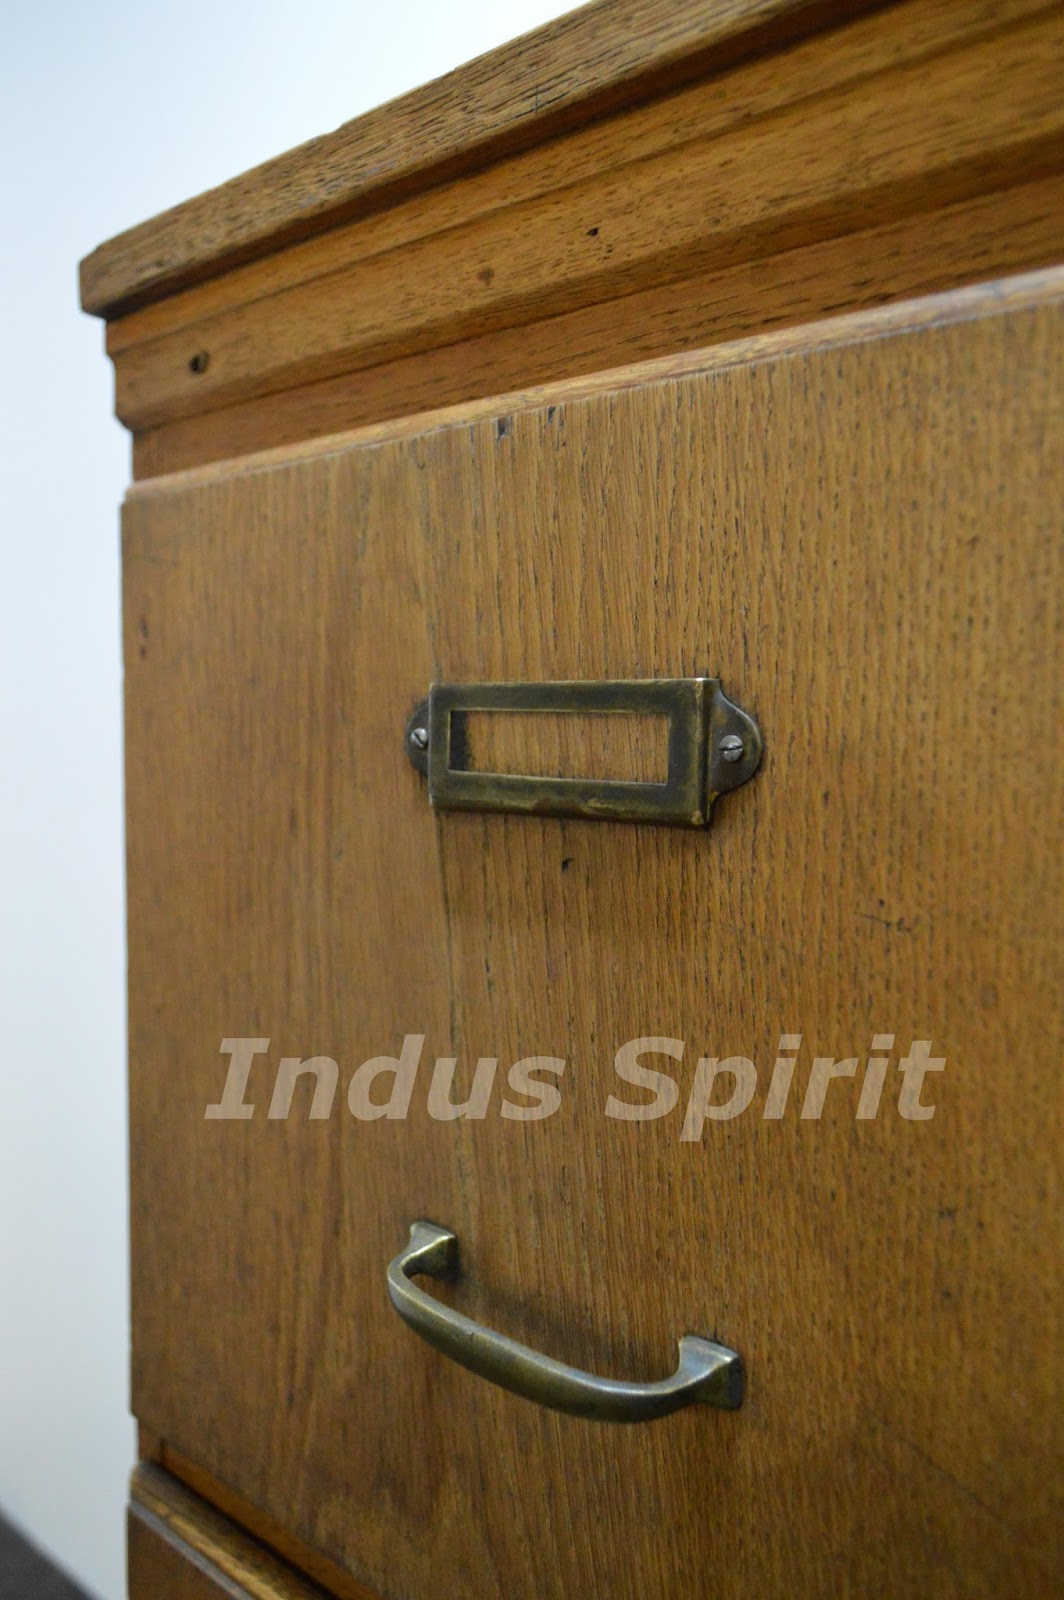 Classeur En Bois Ancien : ancien classeur en bois ancien classeur en bois